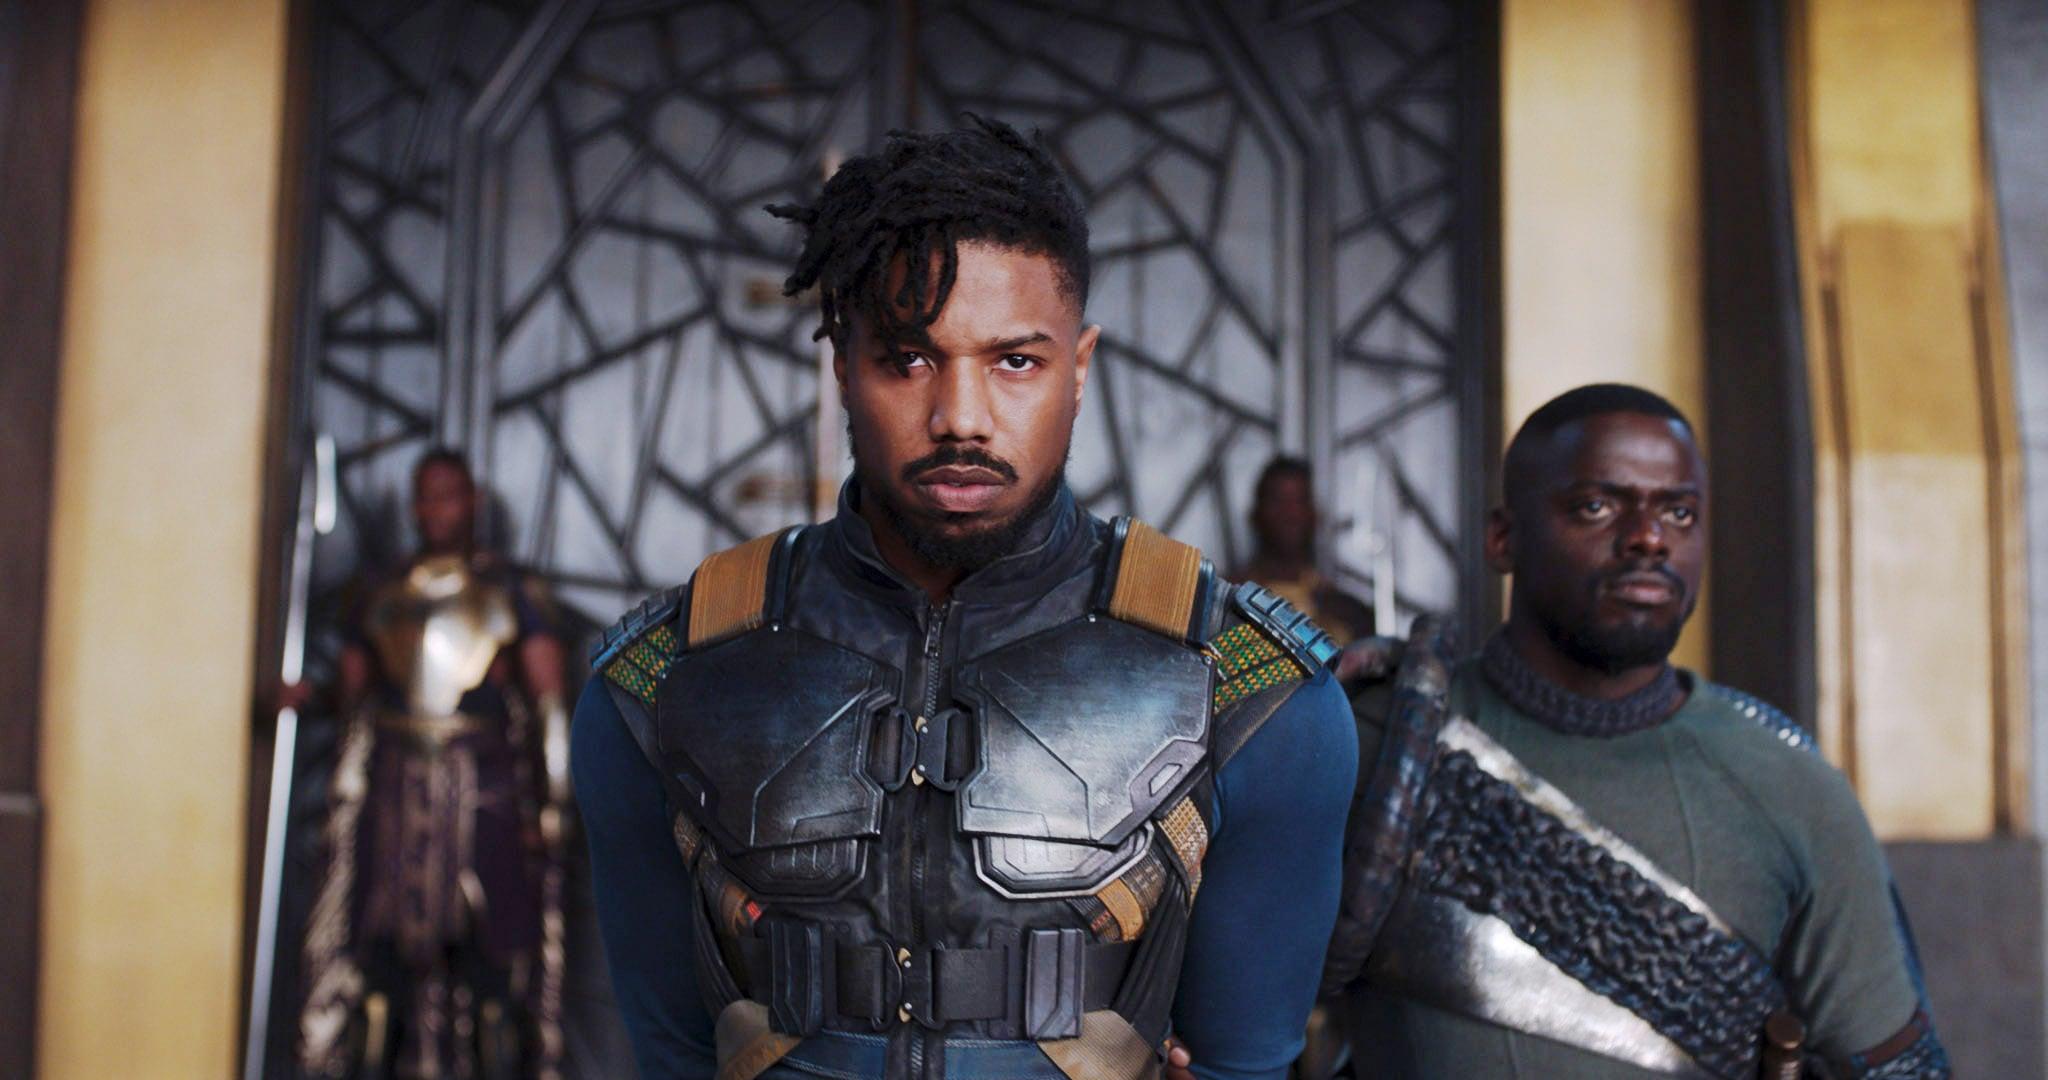 BLACK PANTHER, from left: Michael B. Jordan, Daniel Kaluuya, 2018.  Marvel /  Walt Disney Studios Motion Pictures /Courtesy Everett Collection